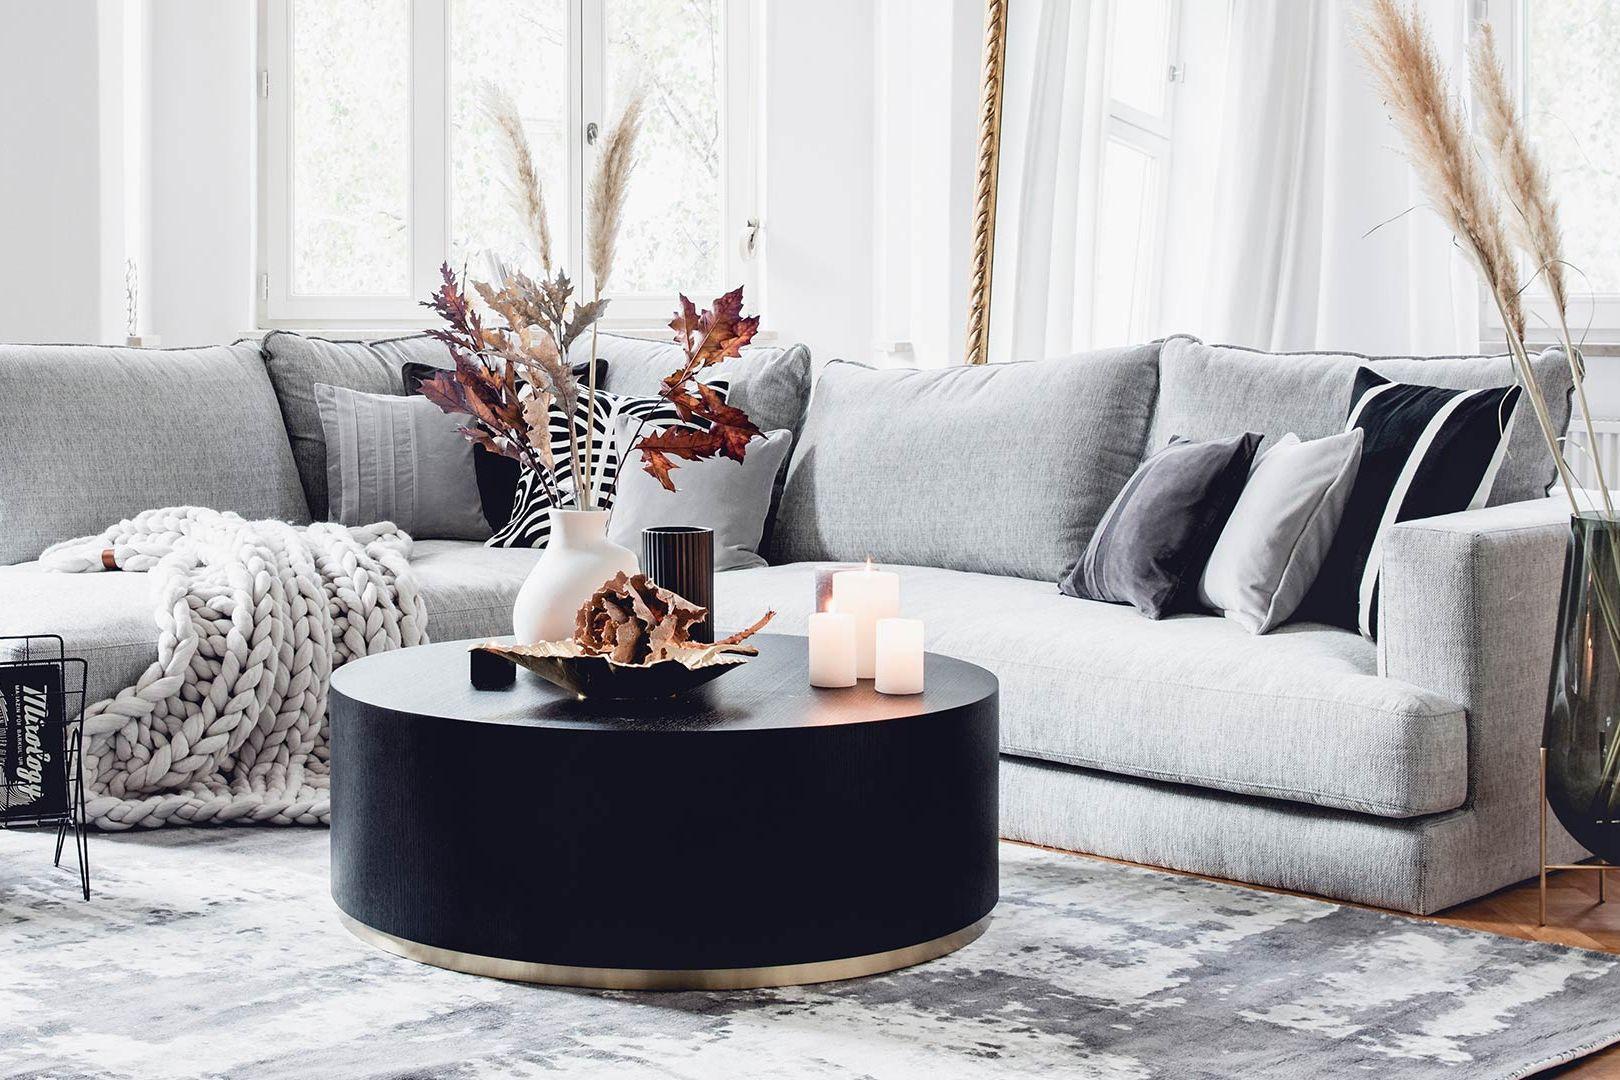 Sofa-Styling: Modern